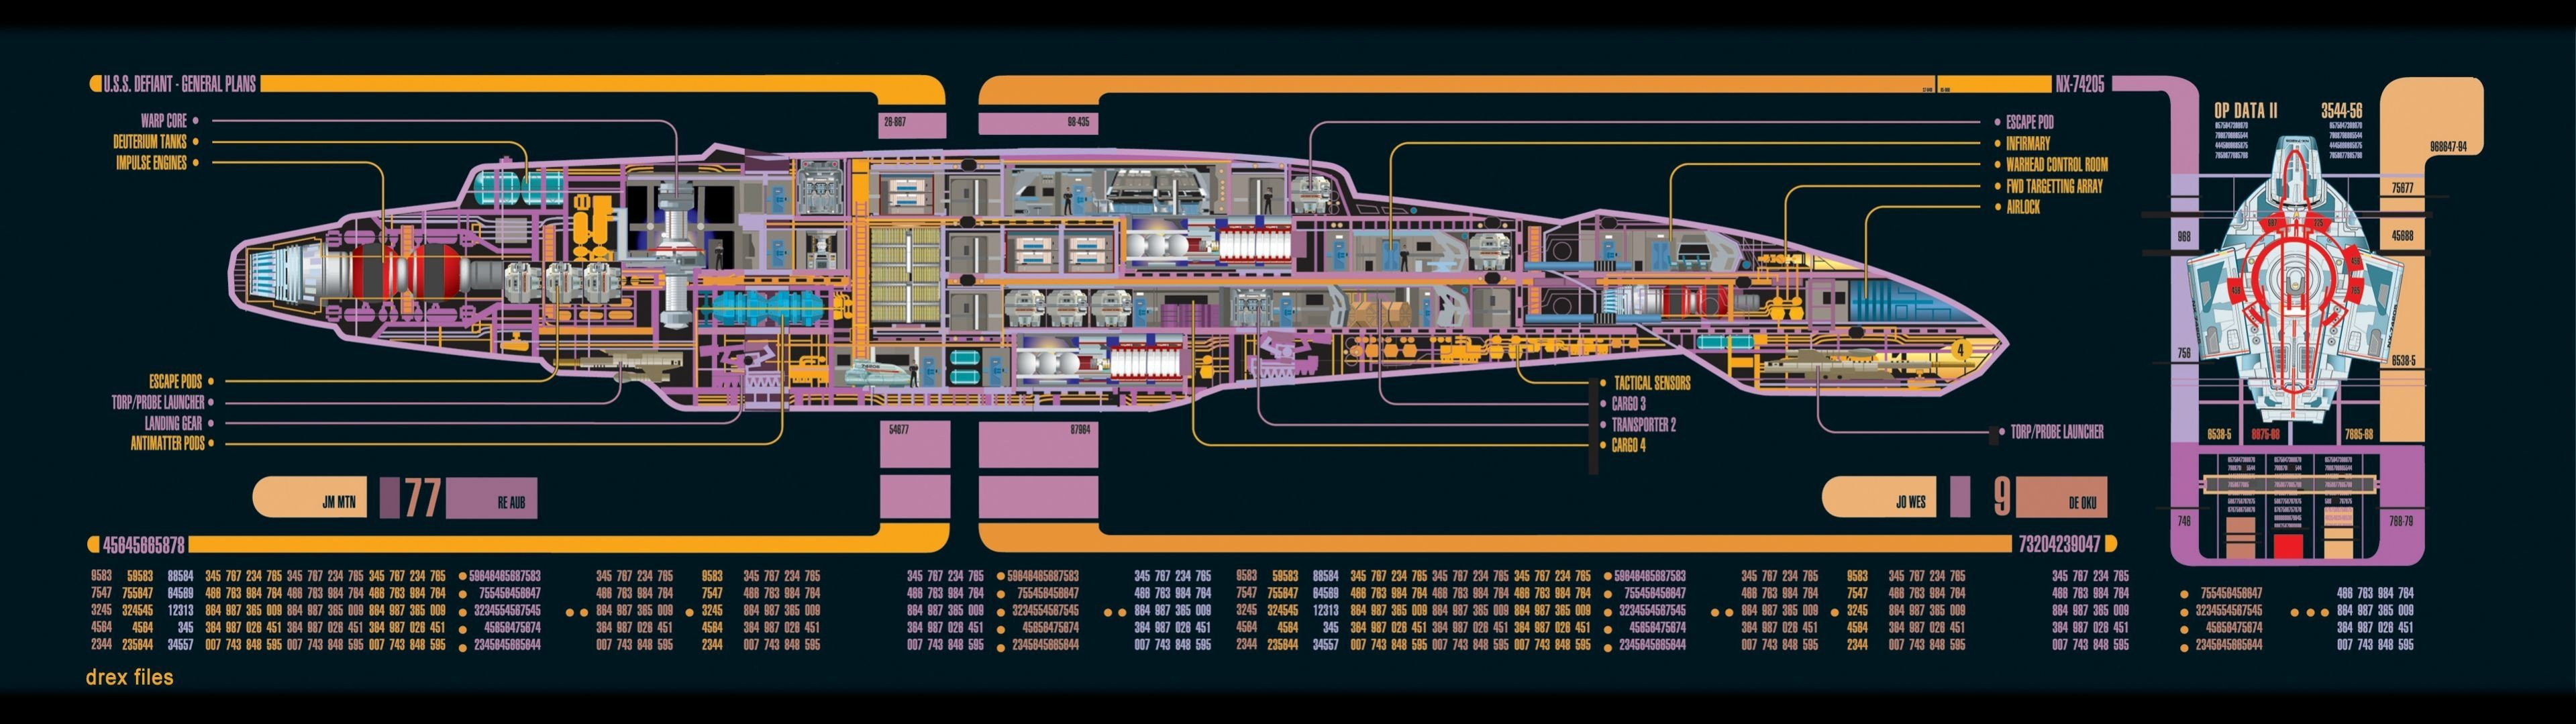 multiple Display, Star Trek, USS Defiant, Deep Space 9 HD Wallpapers / Desktop and Mobile Images & Photos